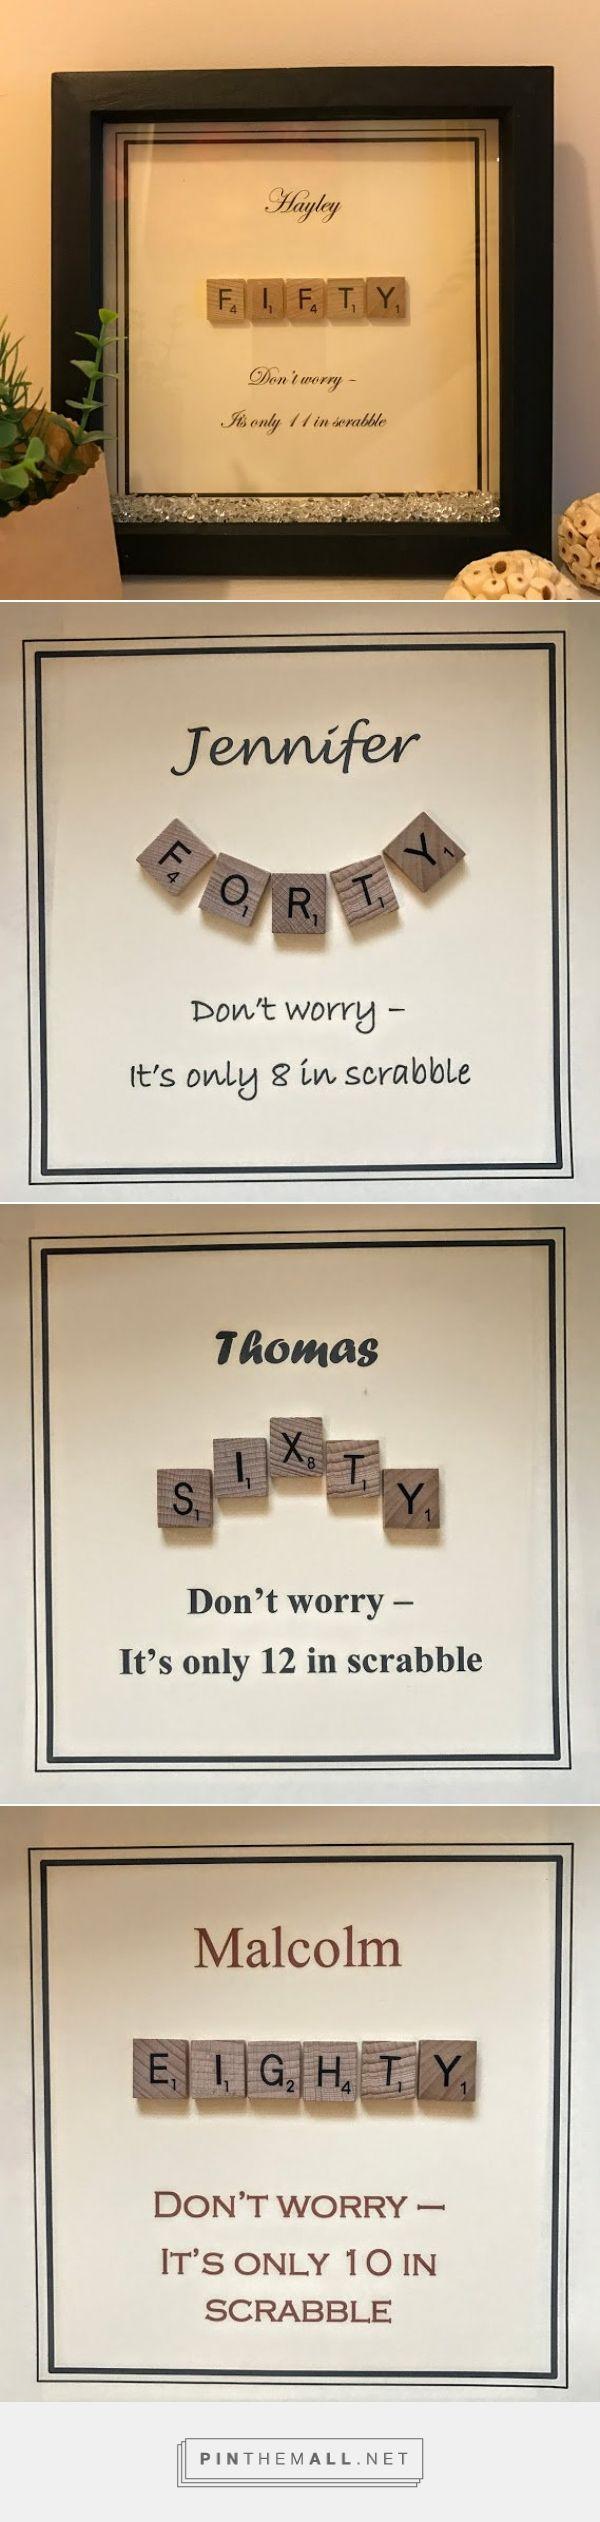 Scrabble birthday frame 30th birthday gift 40th birthday gift 50th birthday gift 60th birthday gift 70th birthday gift 80th birthday gift